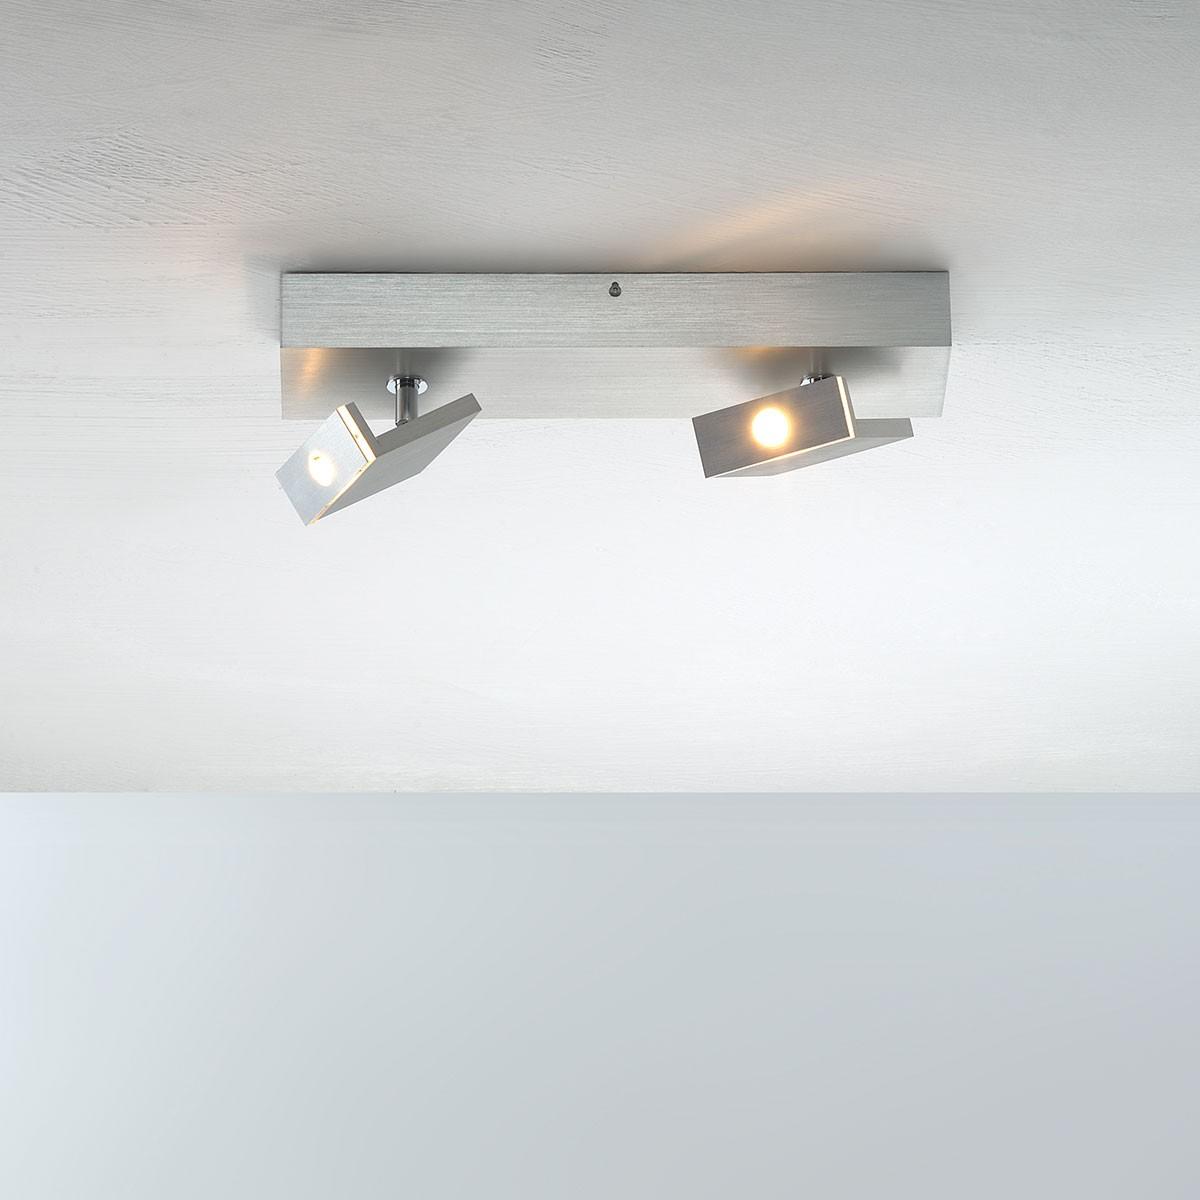 Bopp Elle LED Deckenleuchte mit Casambi Modul, 2-flg., Aluminium geschliffen